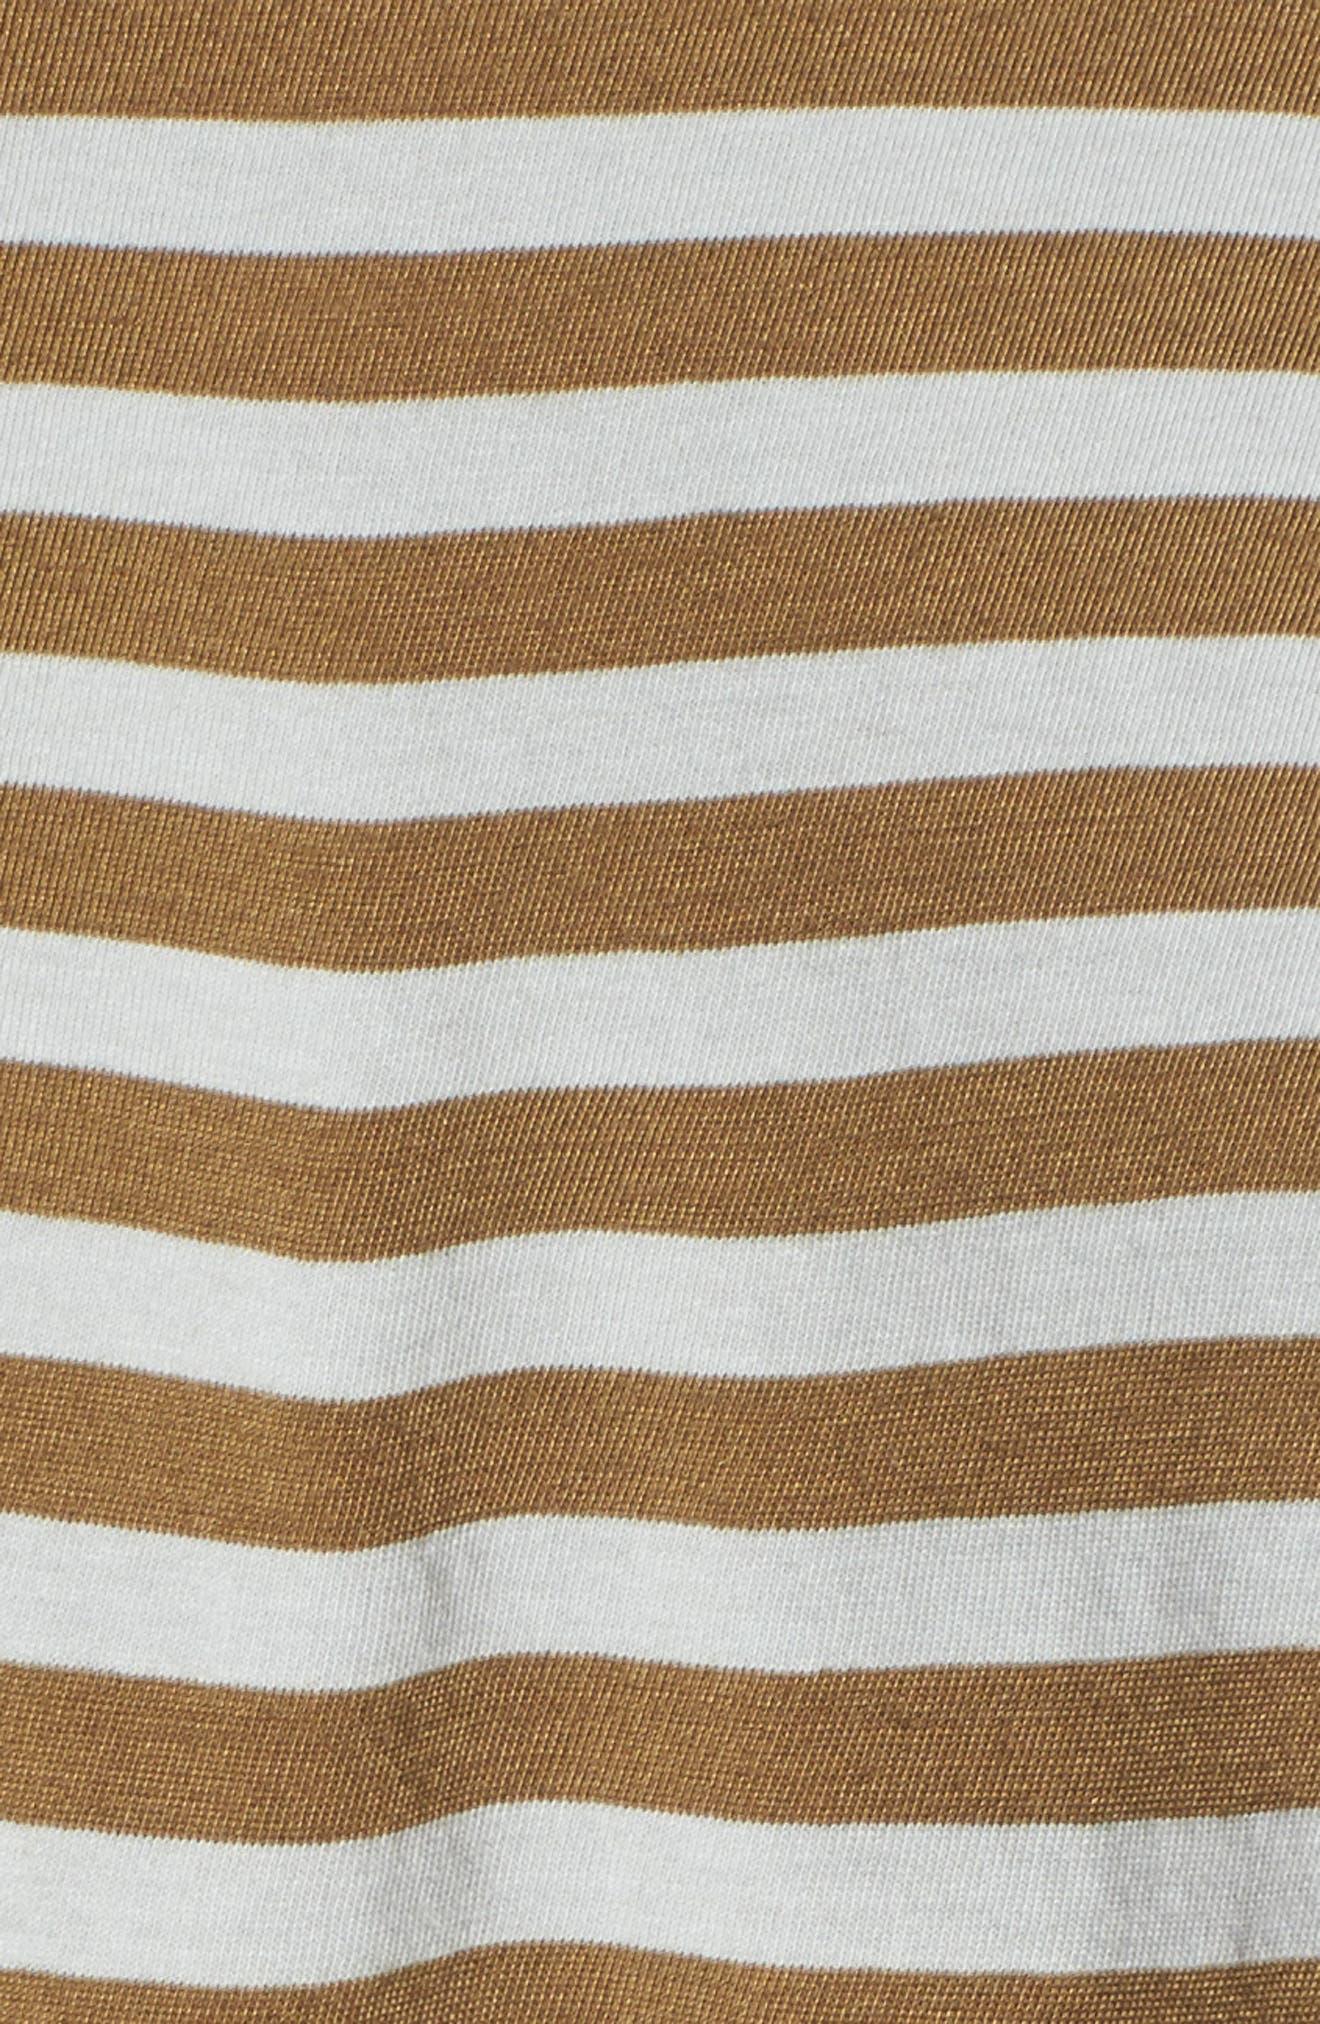 Fern Stripe Twist Front Tee,                             Alternate thumbnail 5, color,                             Silver